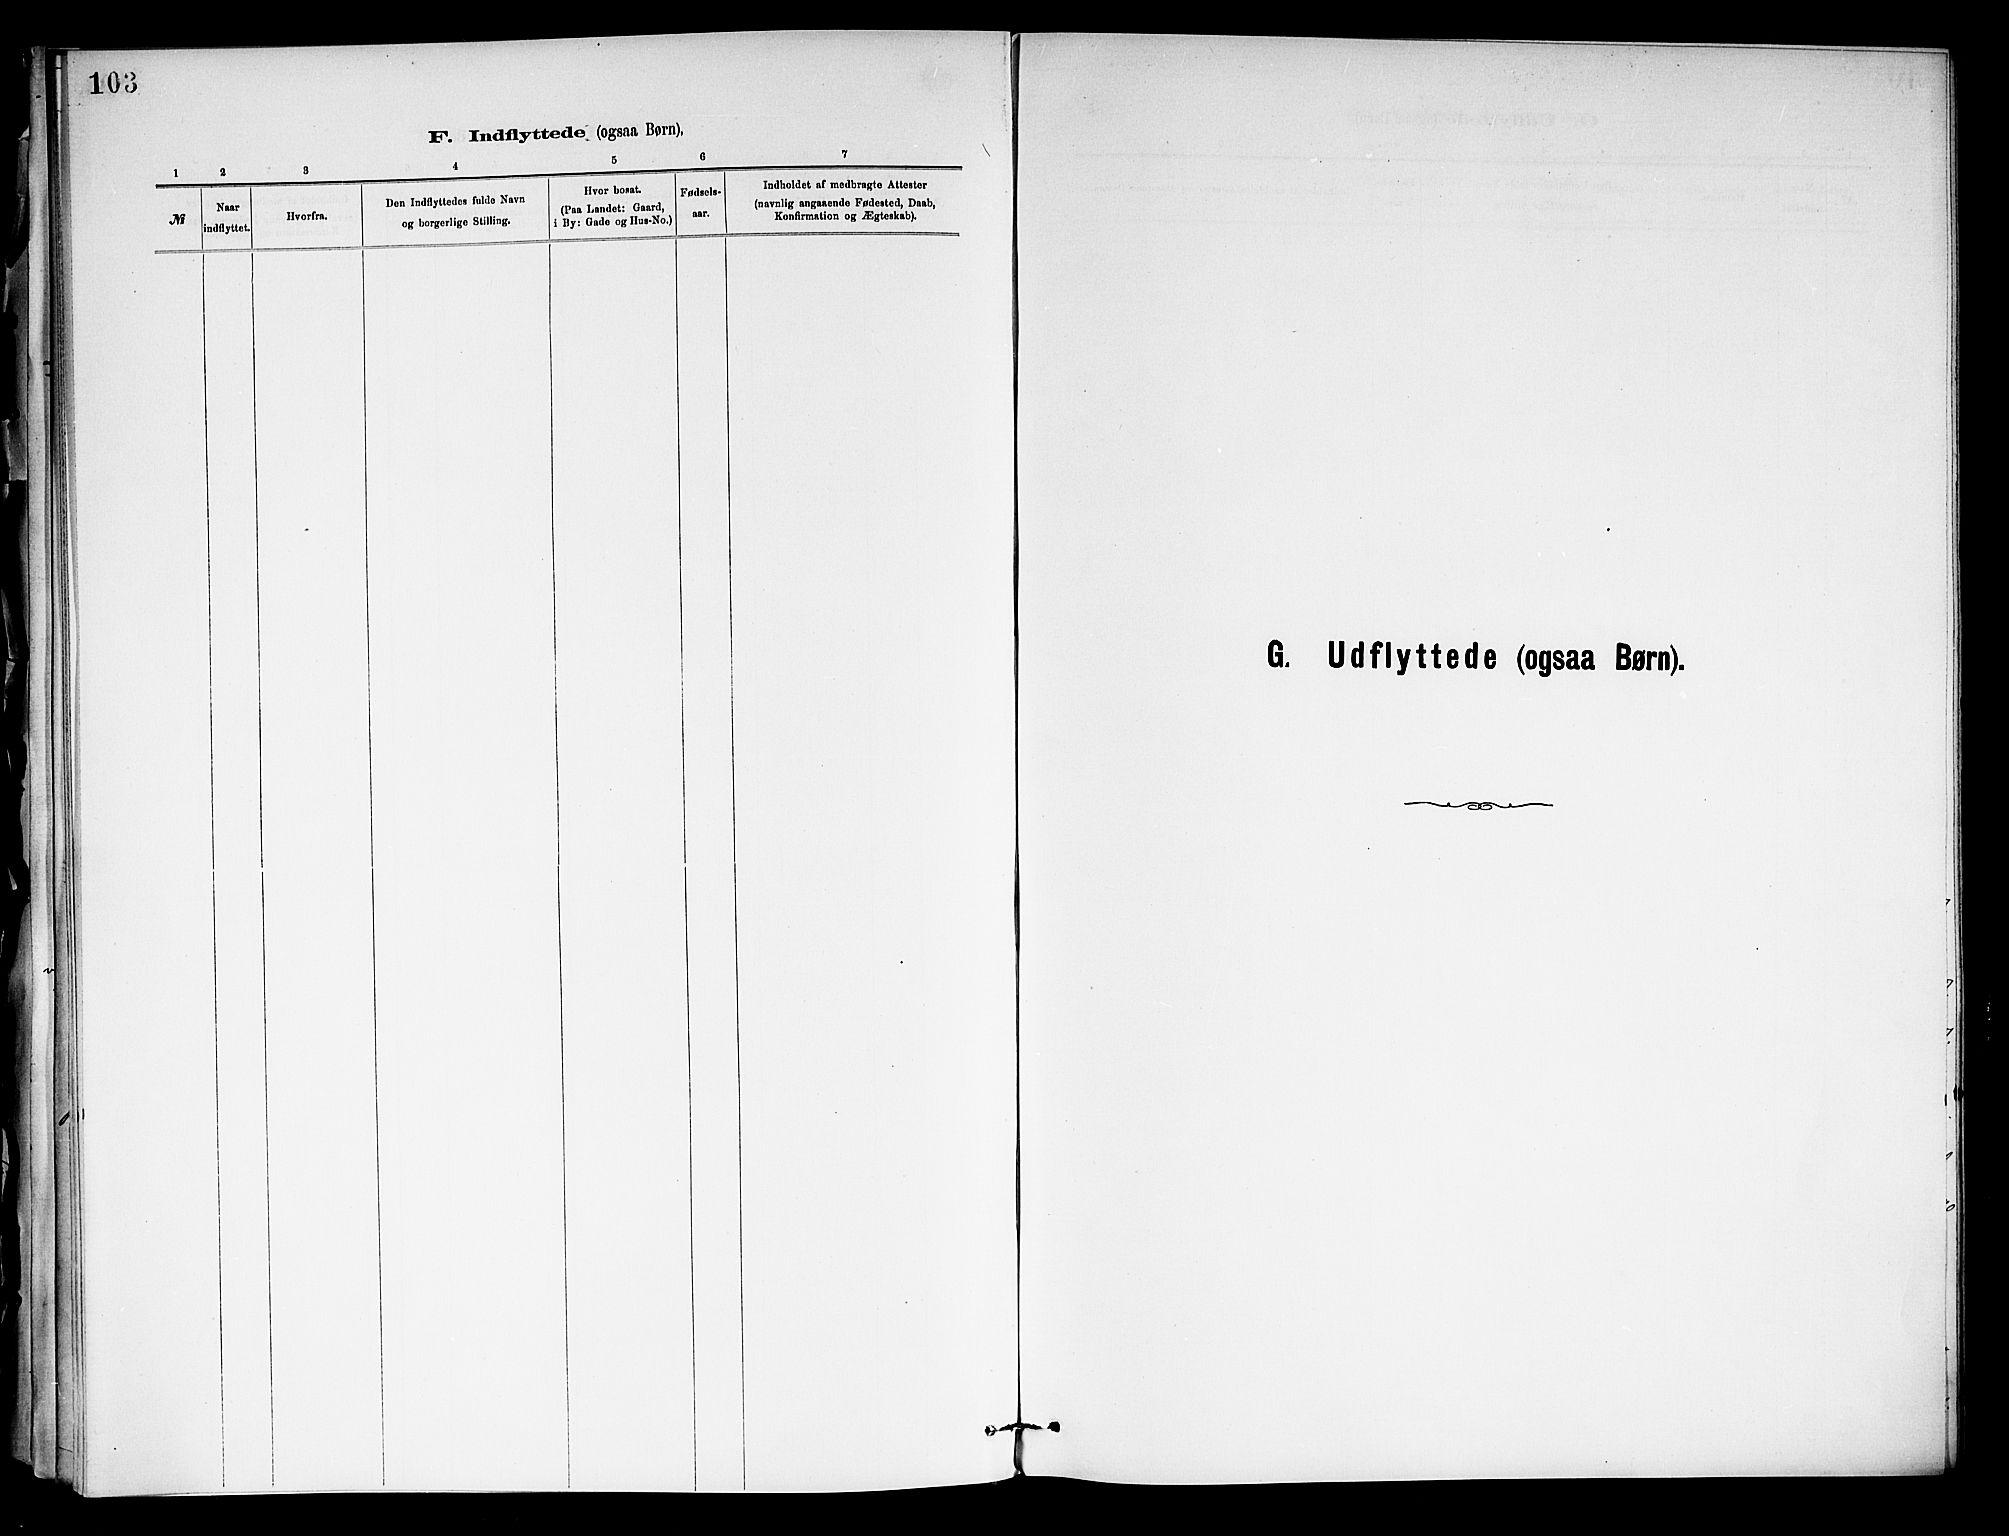 SAKO, Holla kirkebøker, F/Fa/L0009: Ministerialbok nr. 9, 1881-1897, s. 103